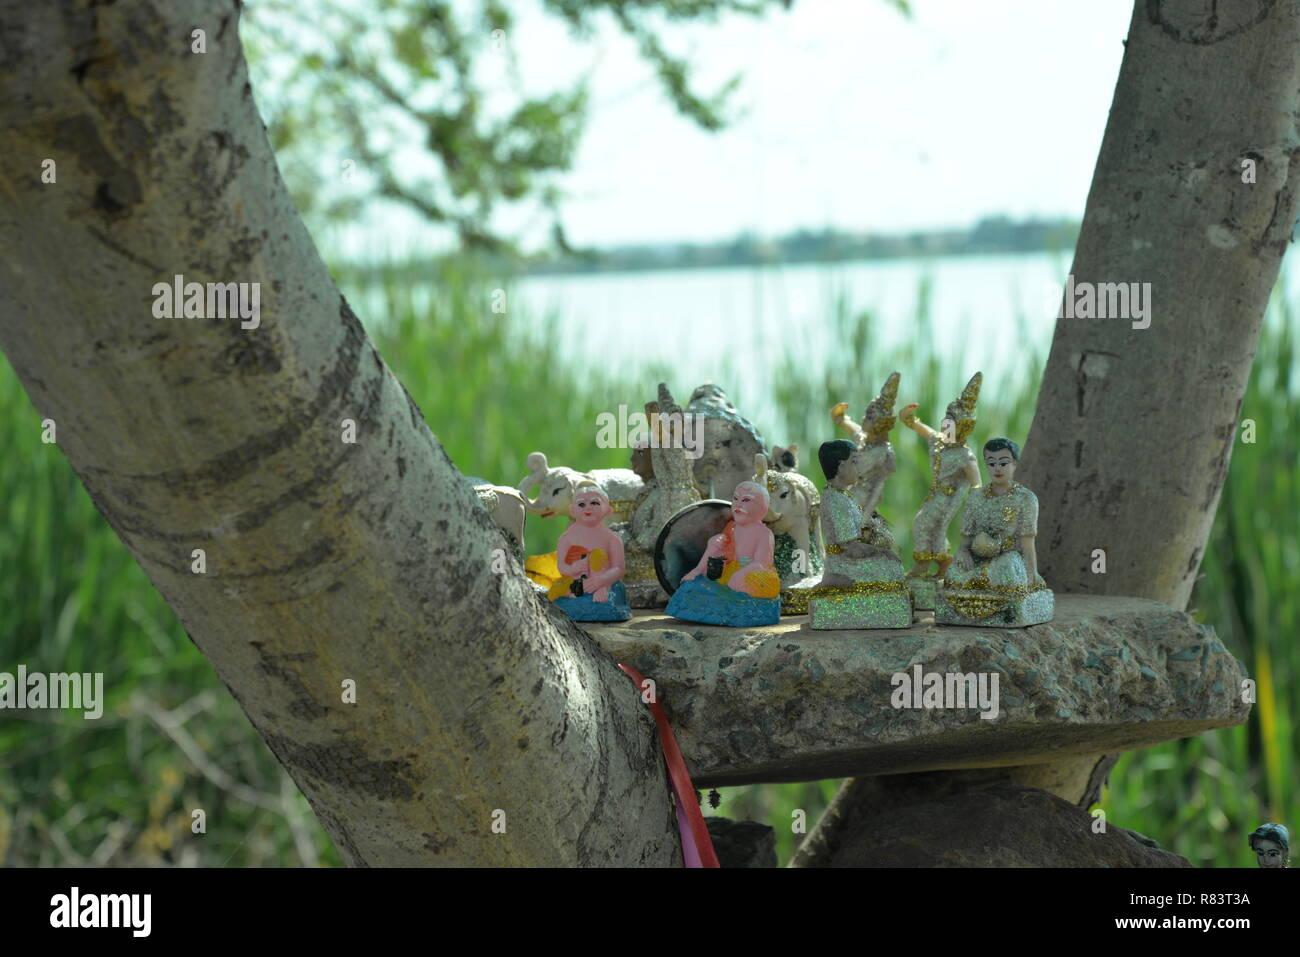 Figurines in a tree, pasakdek - Stock Image